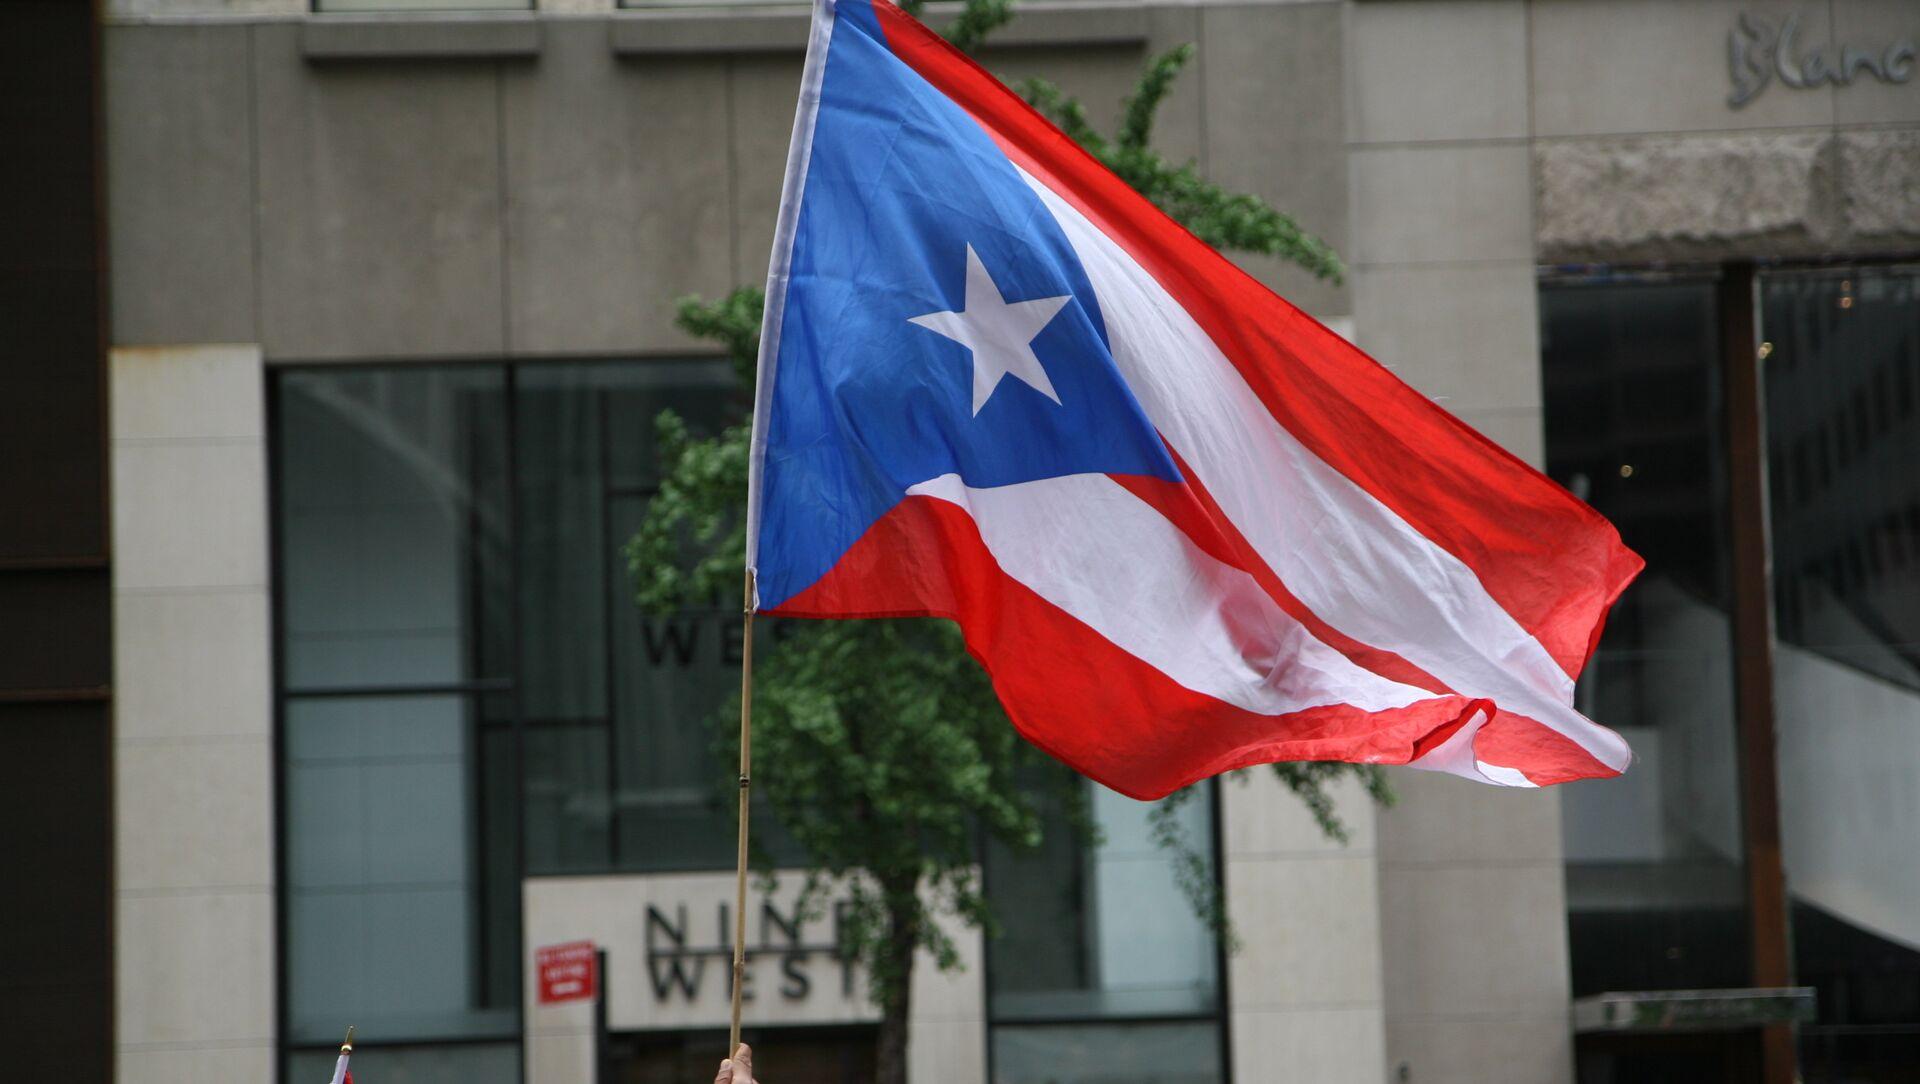 Bandera de Puerto Rico - Sputnik Mundo, 1920, 28.10.2020